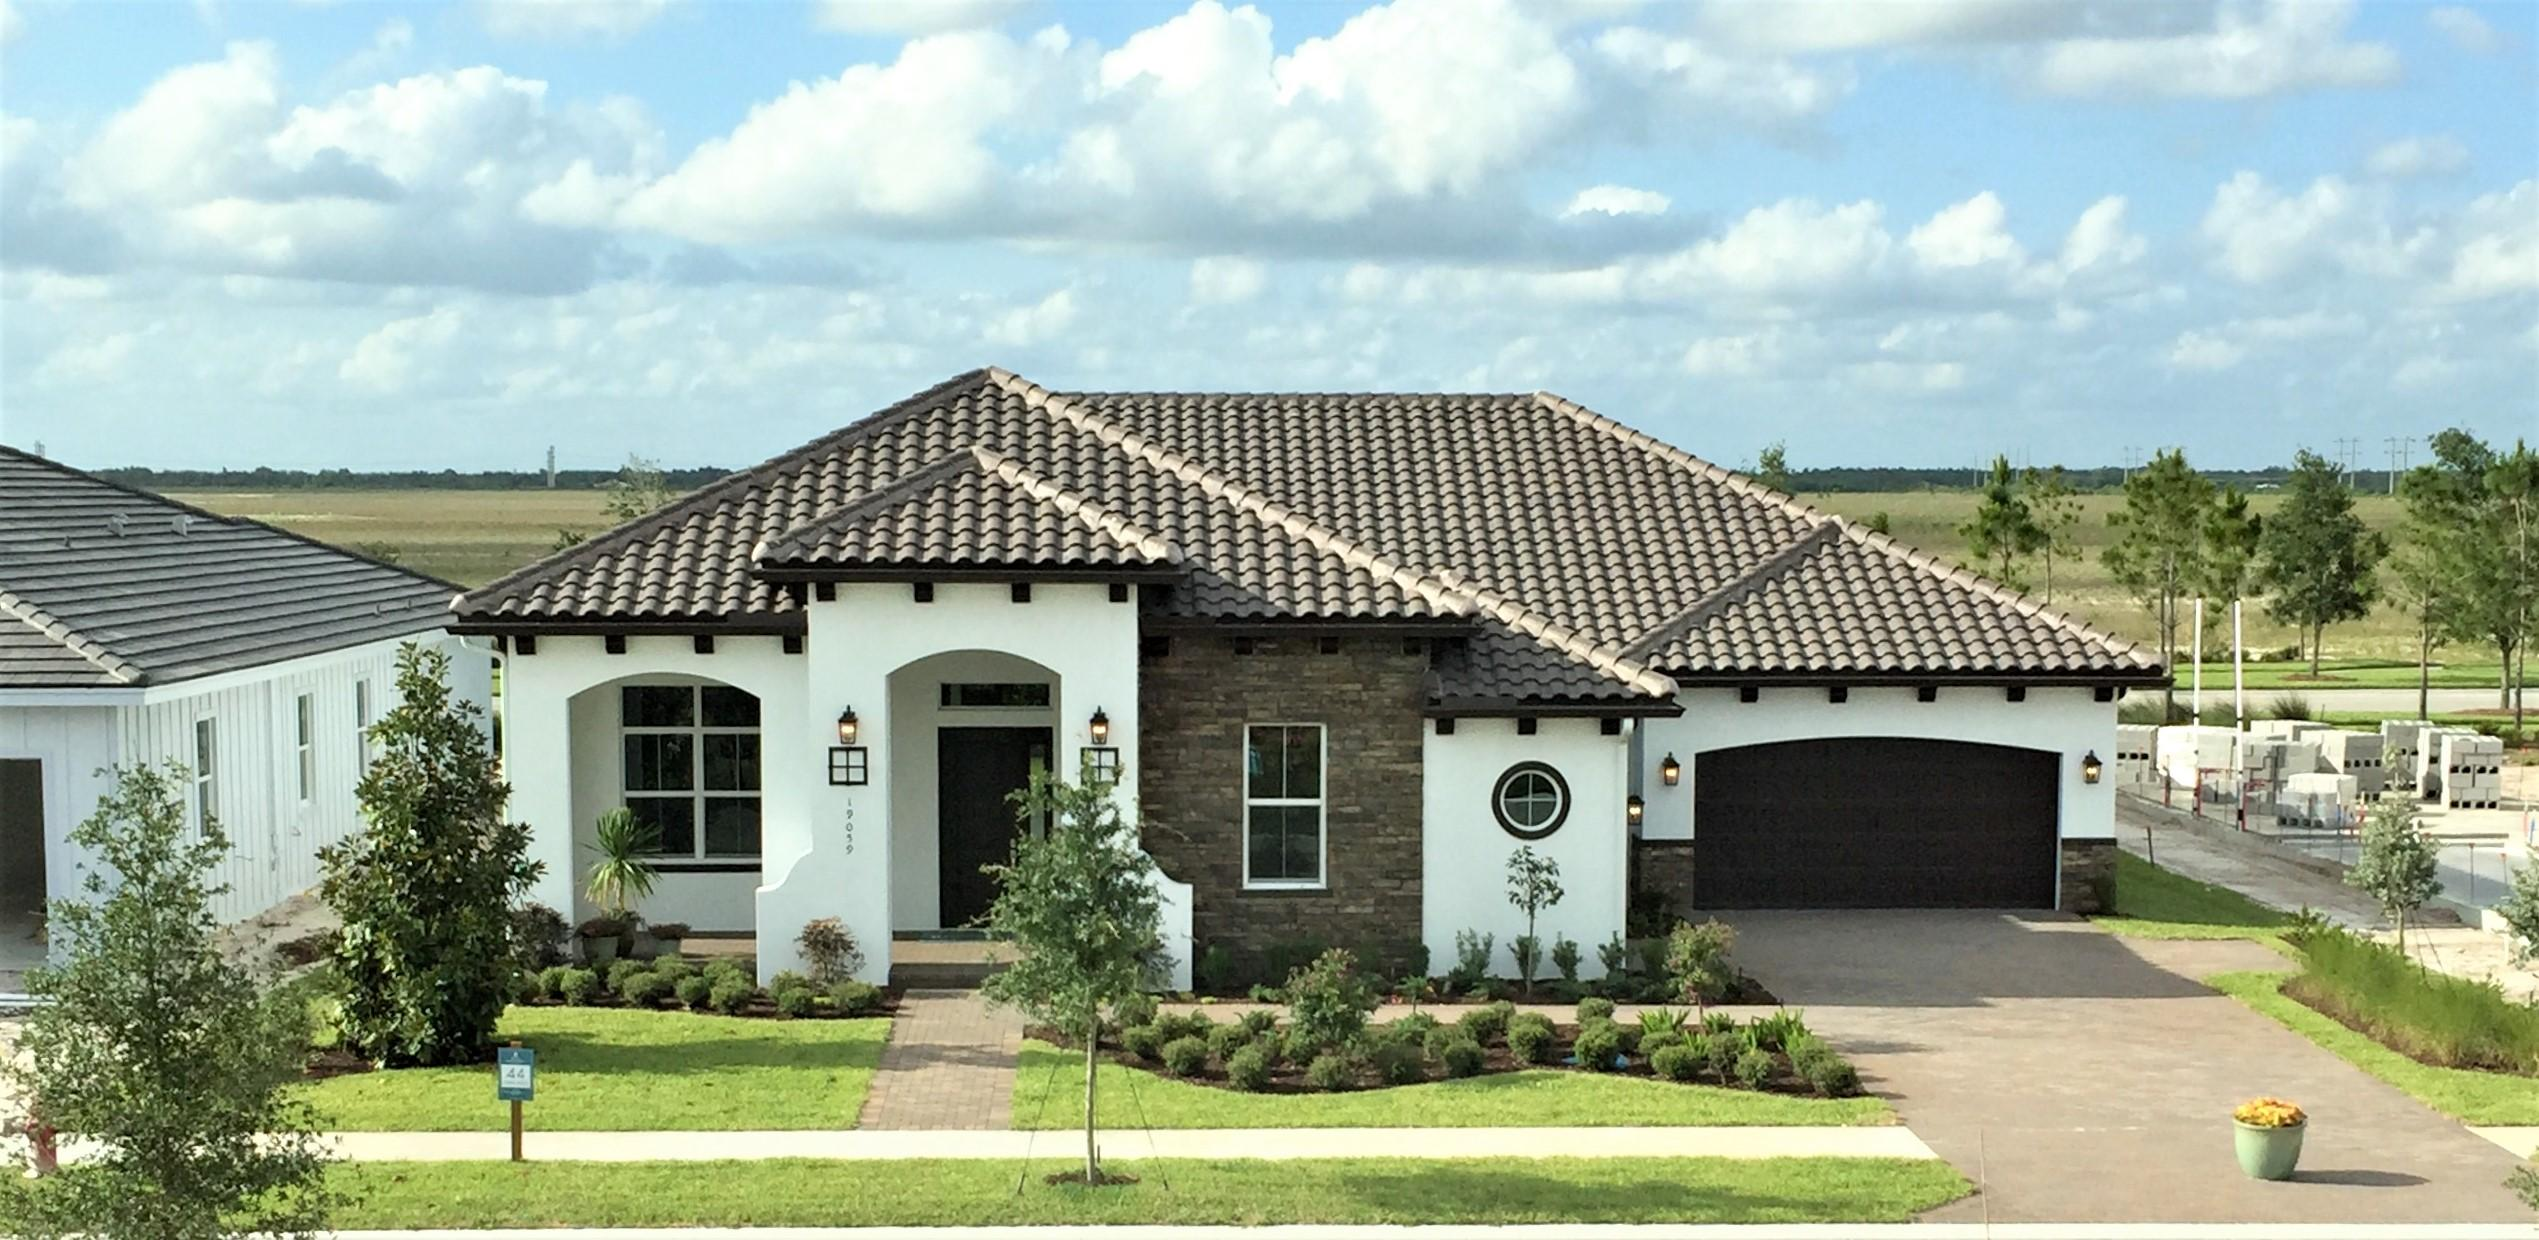 19059 Fly Rod Run, Loxahatchee in Palm Beach County, FL 33470 Home for Sale